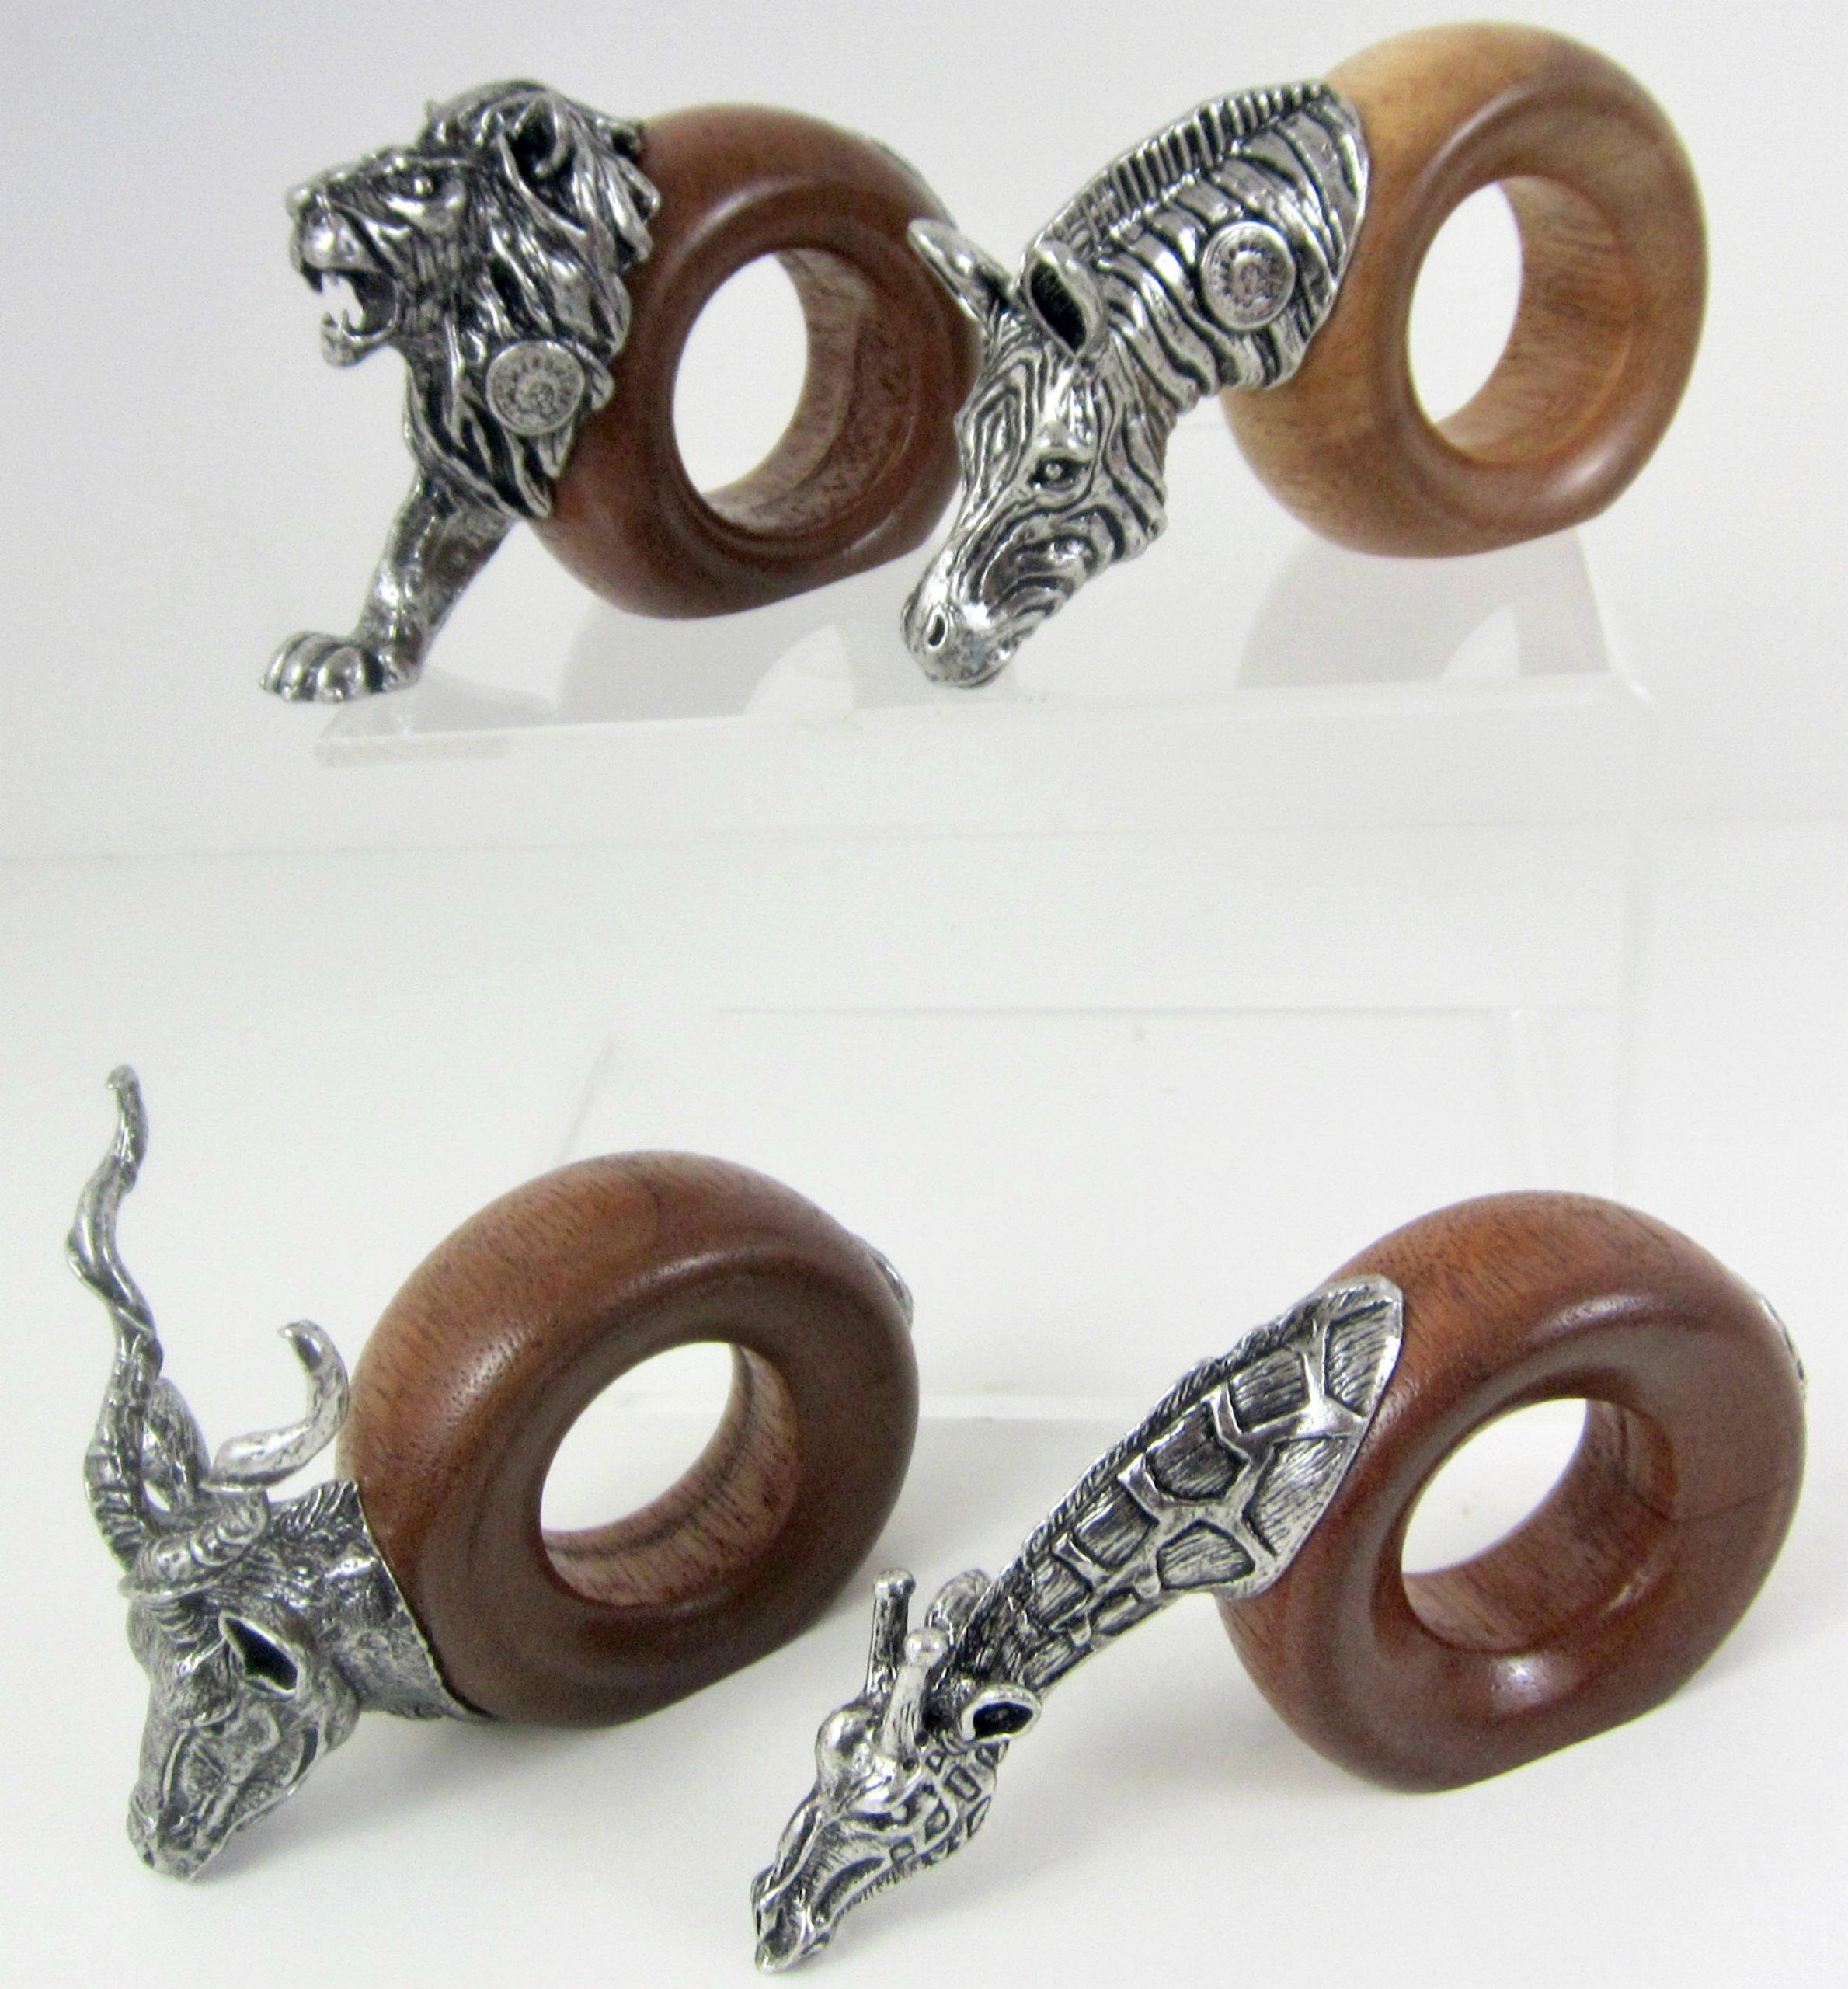 Jungle Safari Figural Napkin Ring Set 4, Design A, South AFRICA Signed Pewter & Wood, Lion Giraffe Zebra Kudu Wildlife